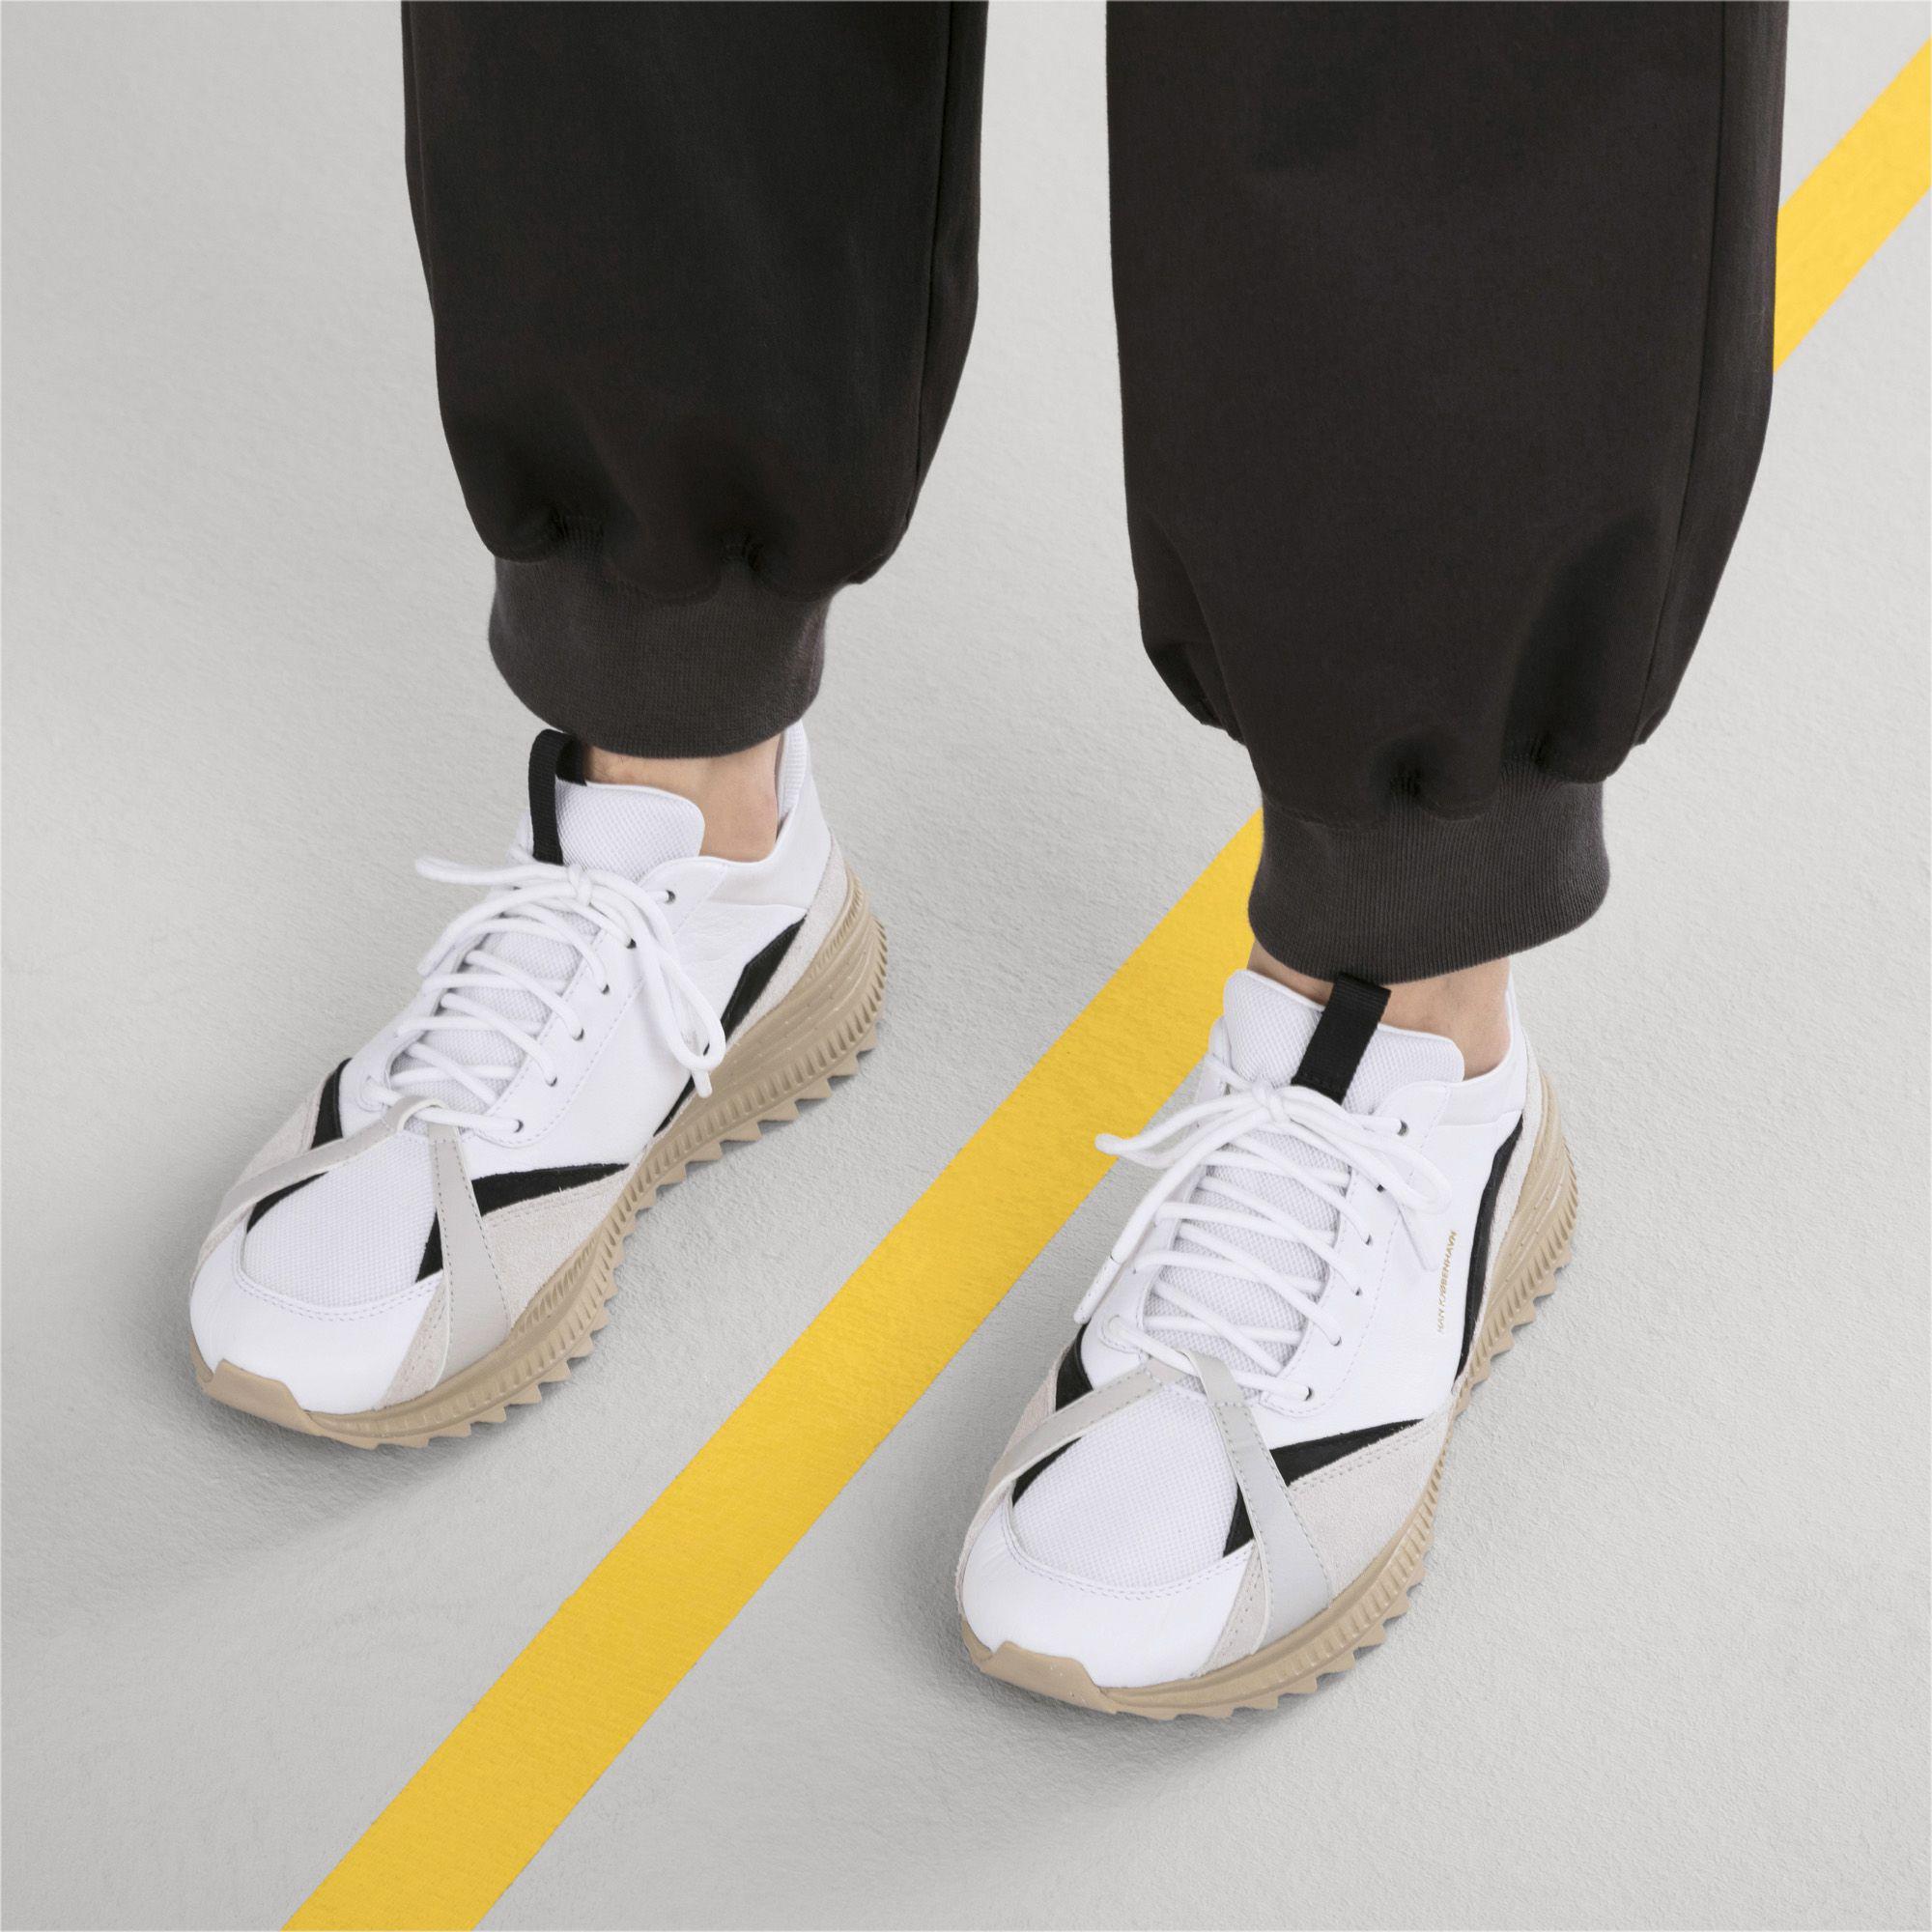 72e02ba75358c9 Lyst - PUMA X Han Kjøbenhavn Avid Sneakers in White for Men